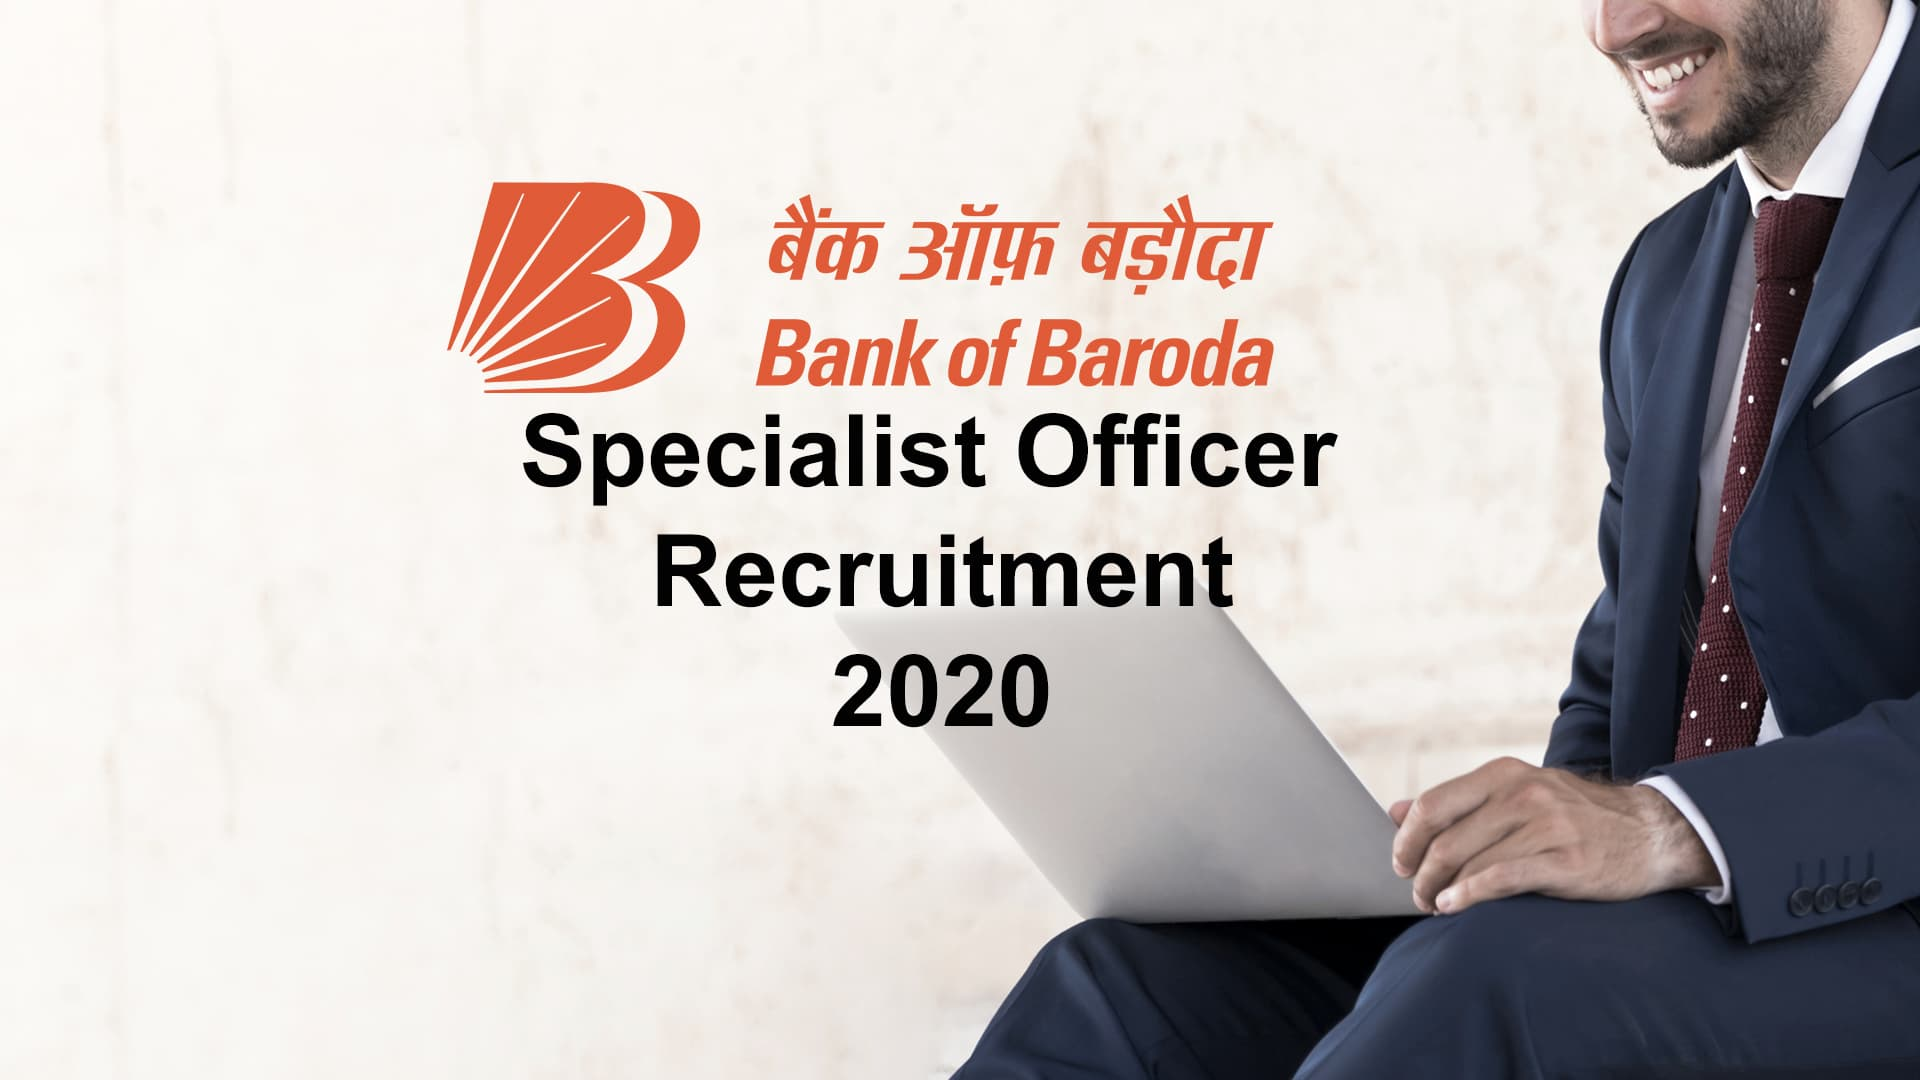 Bank of baroda Specialist Officer Recruitment 2020